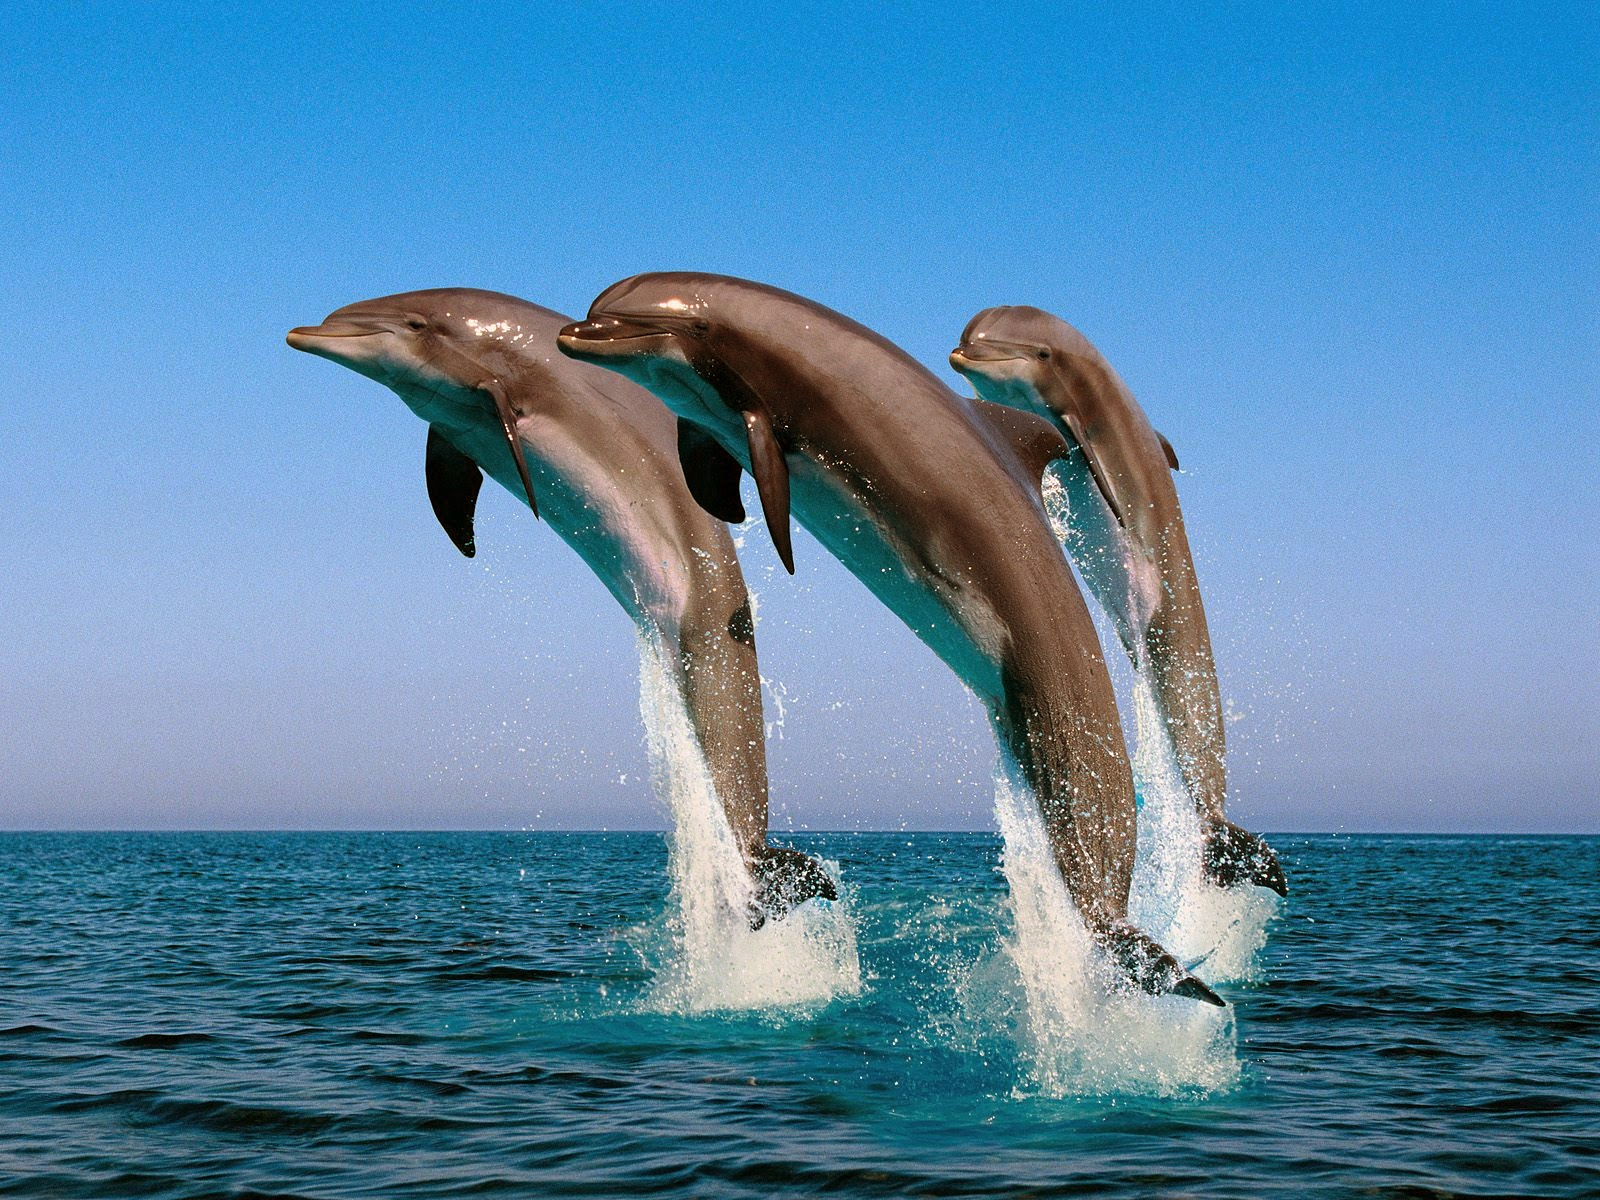 wild animal wallpaper hd free downloads   pet photos and wildlife